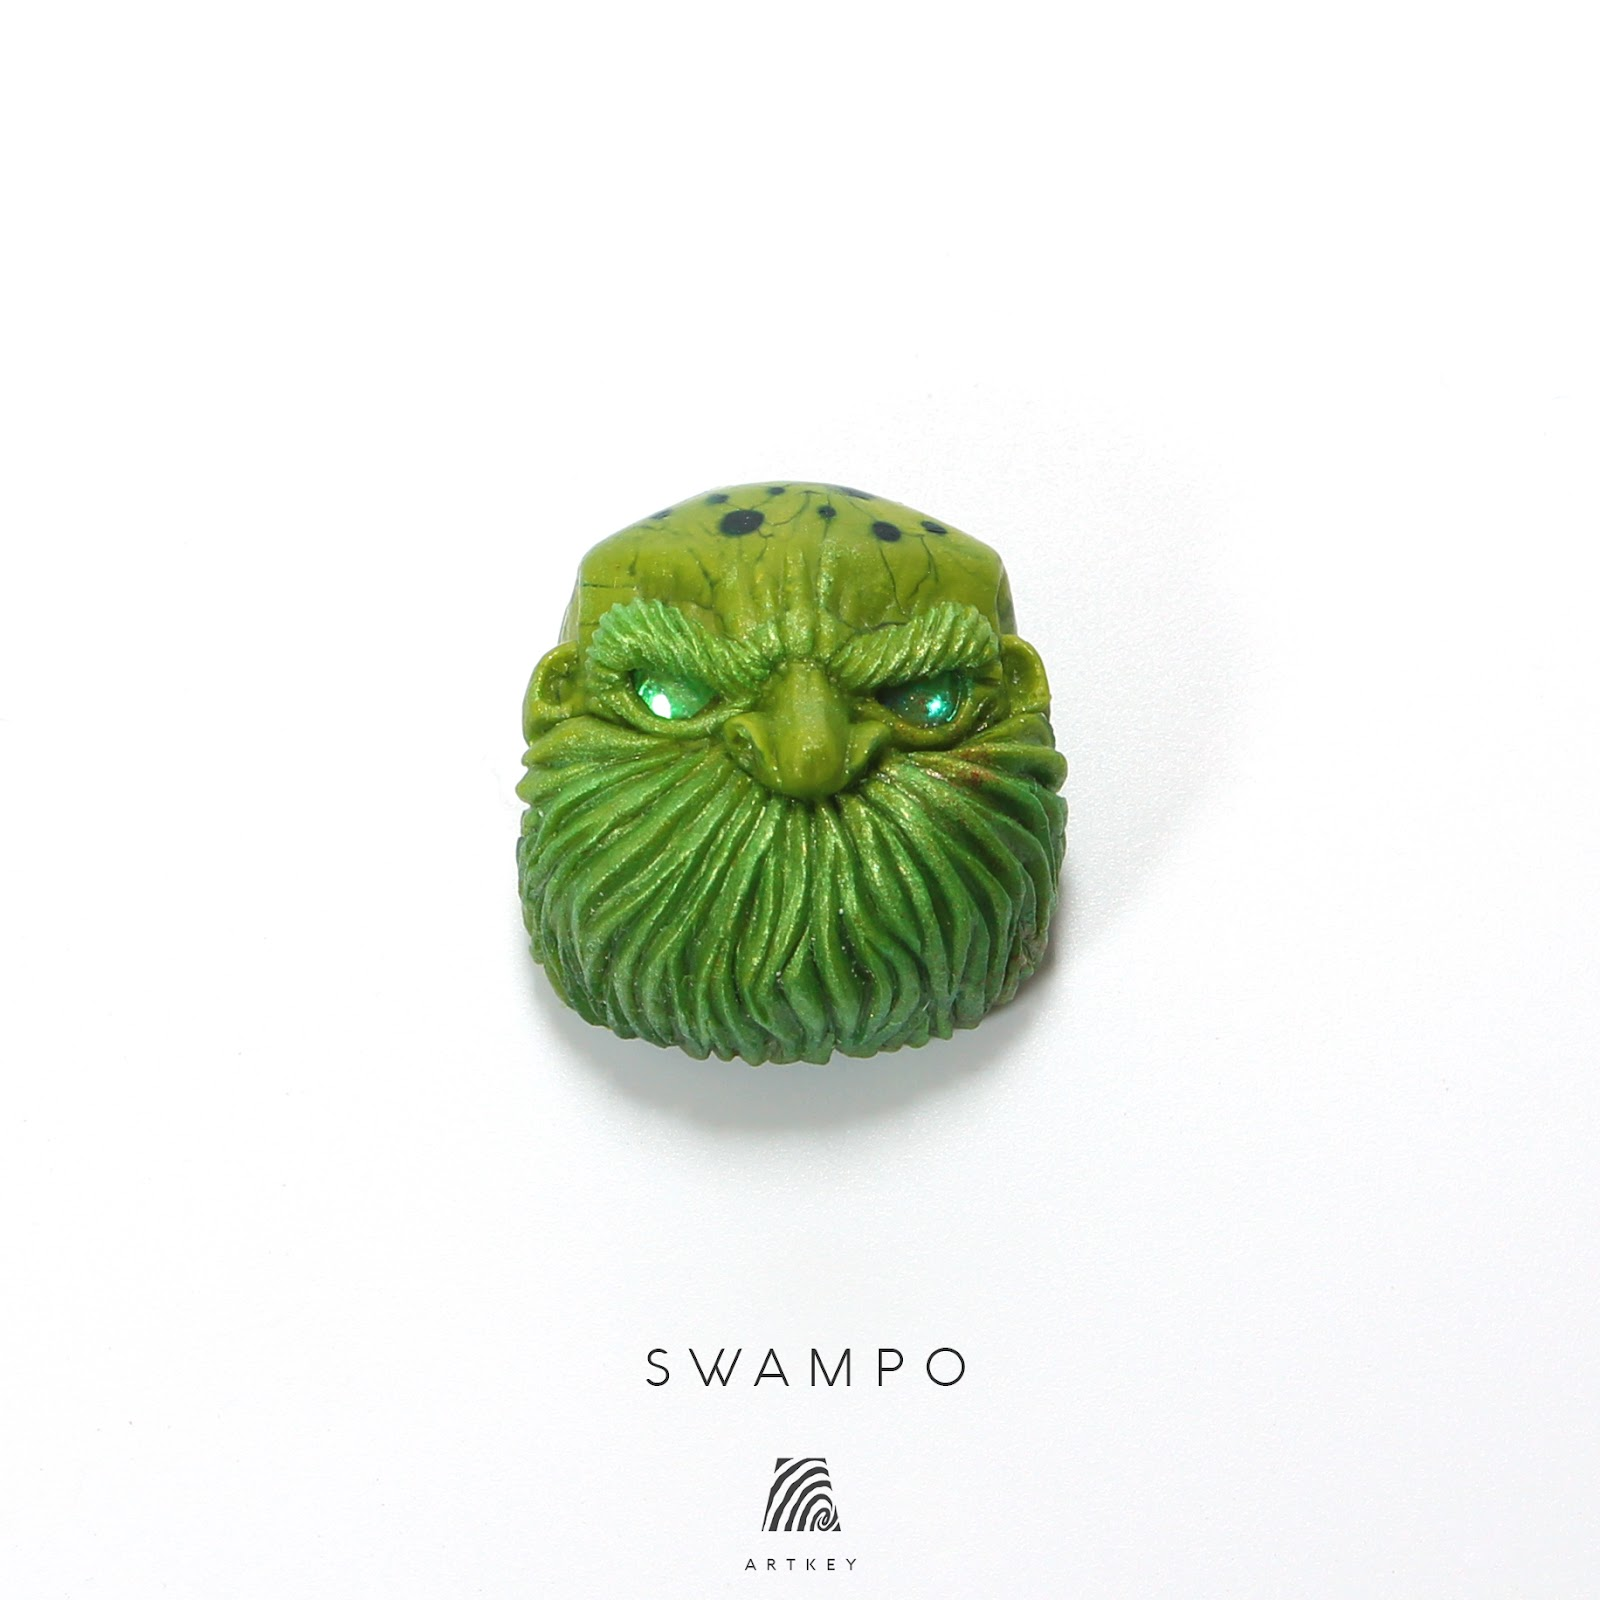 Artkey - Swampo Jack Bald